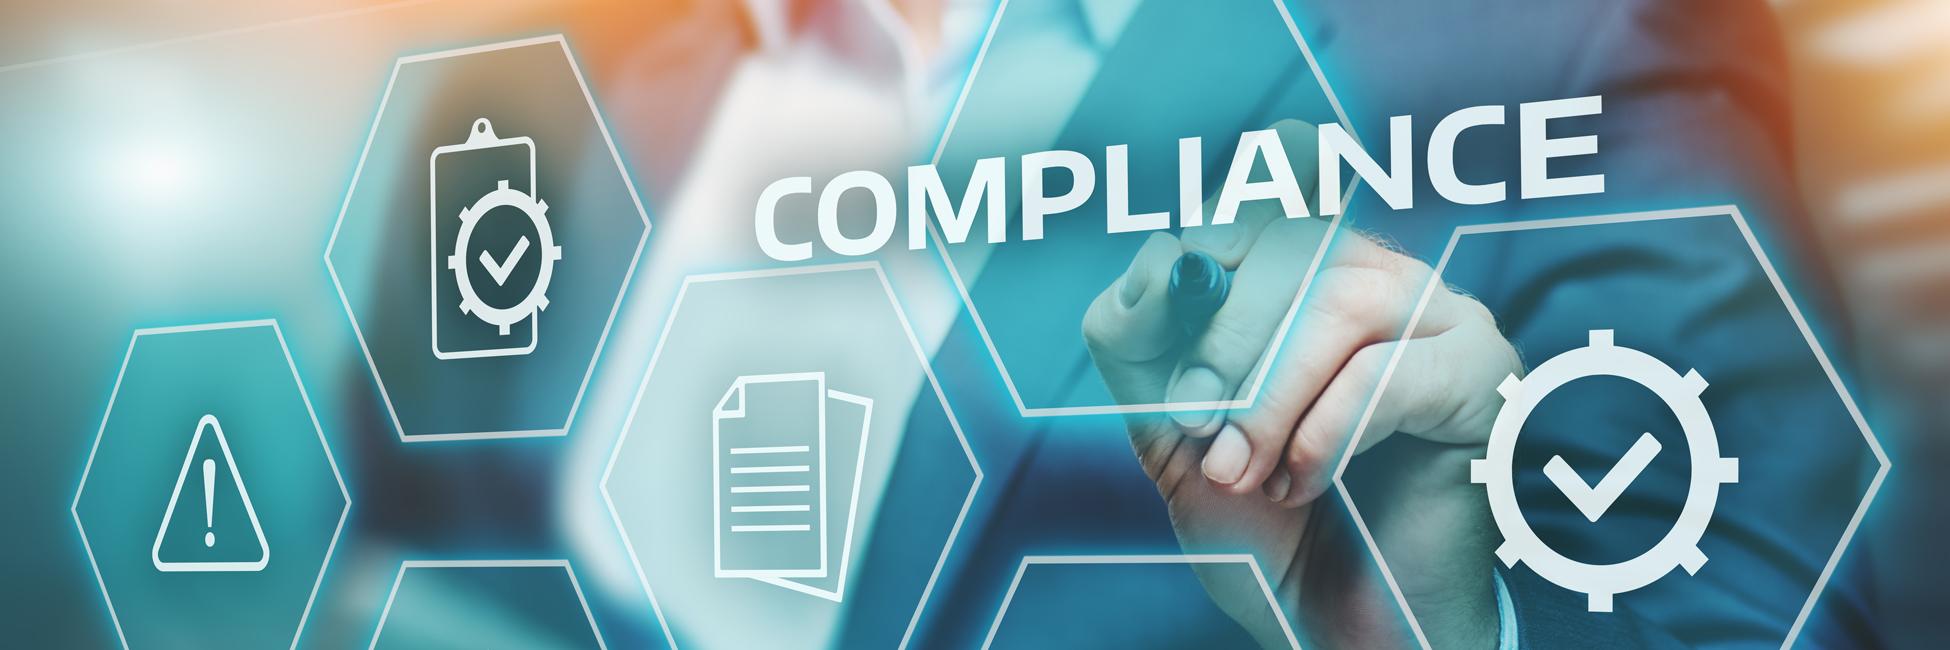 Landingpage_Webinar_Compliance_KYC_1950x650